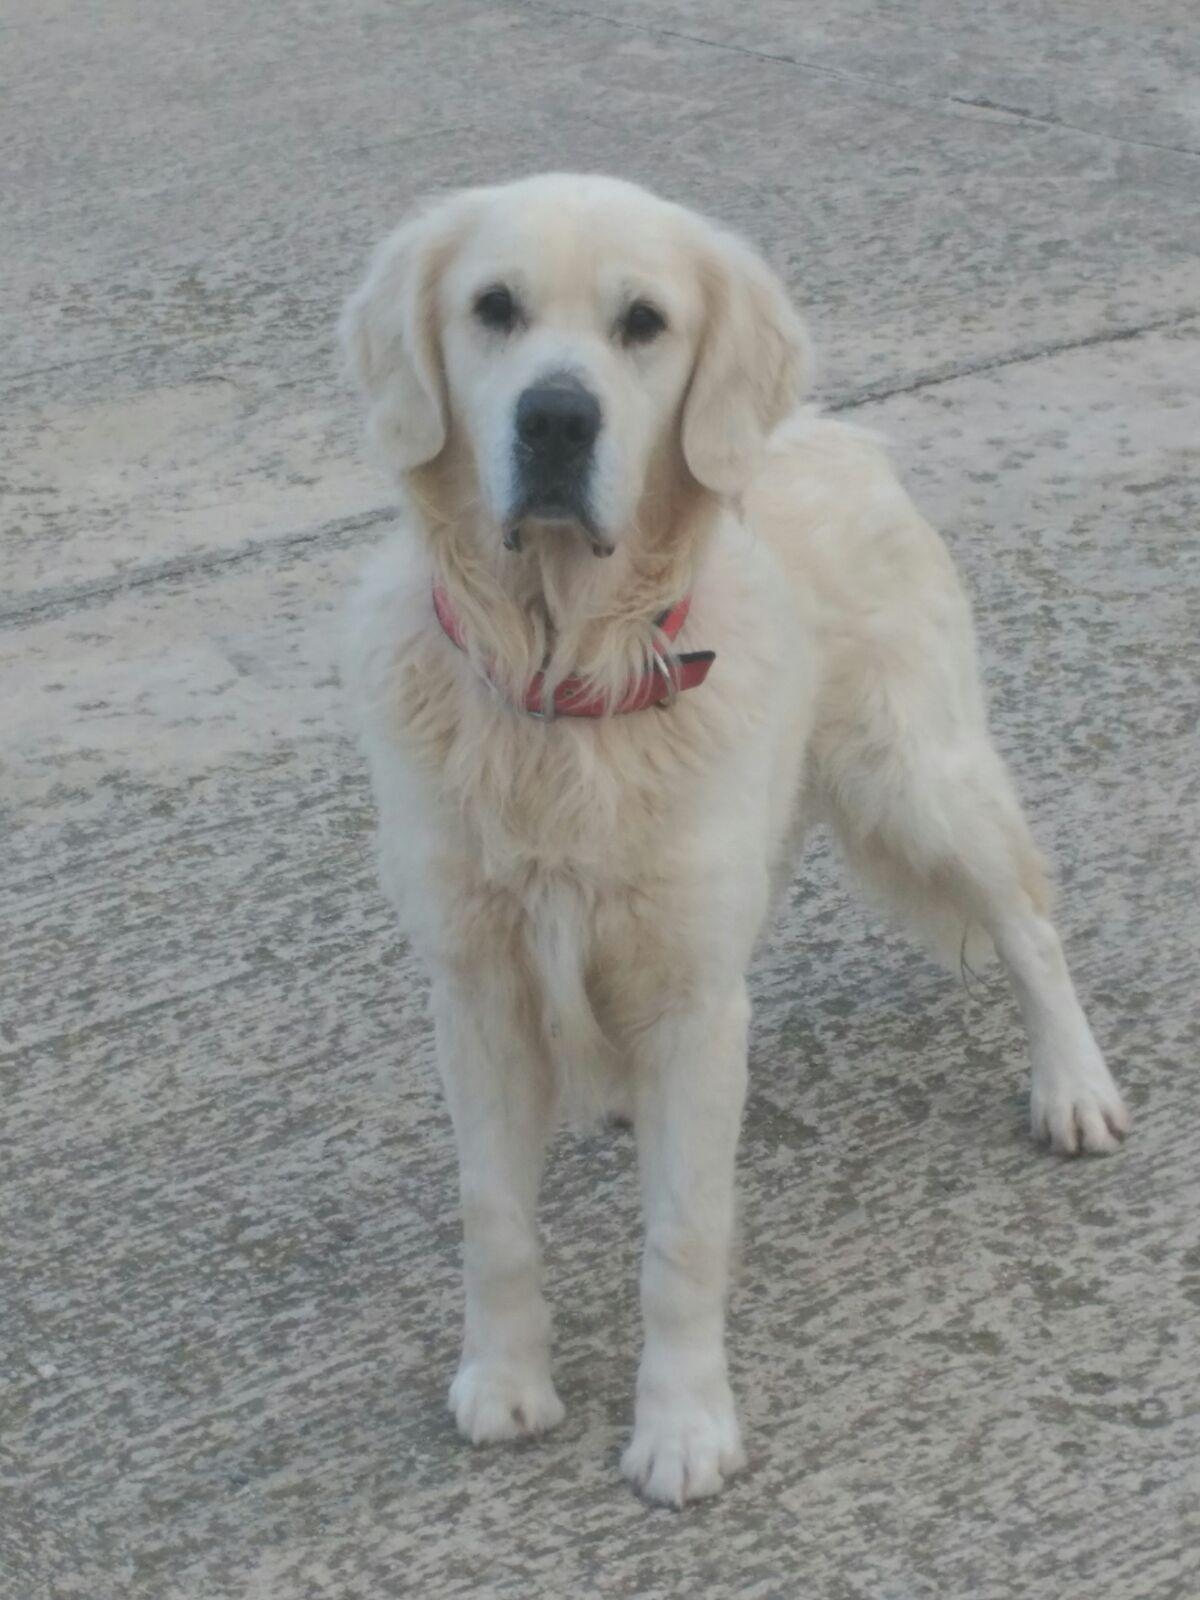 Protectora d 39 animals lydia argil s blanc urge un nuevo for Banc sabadell pisos